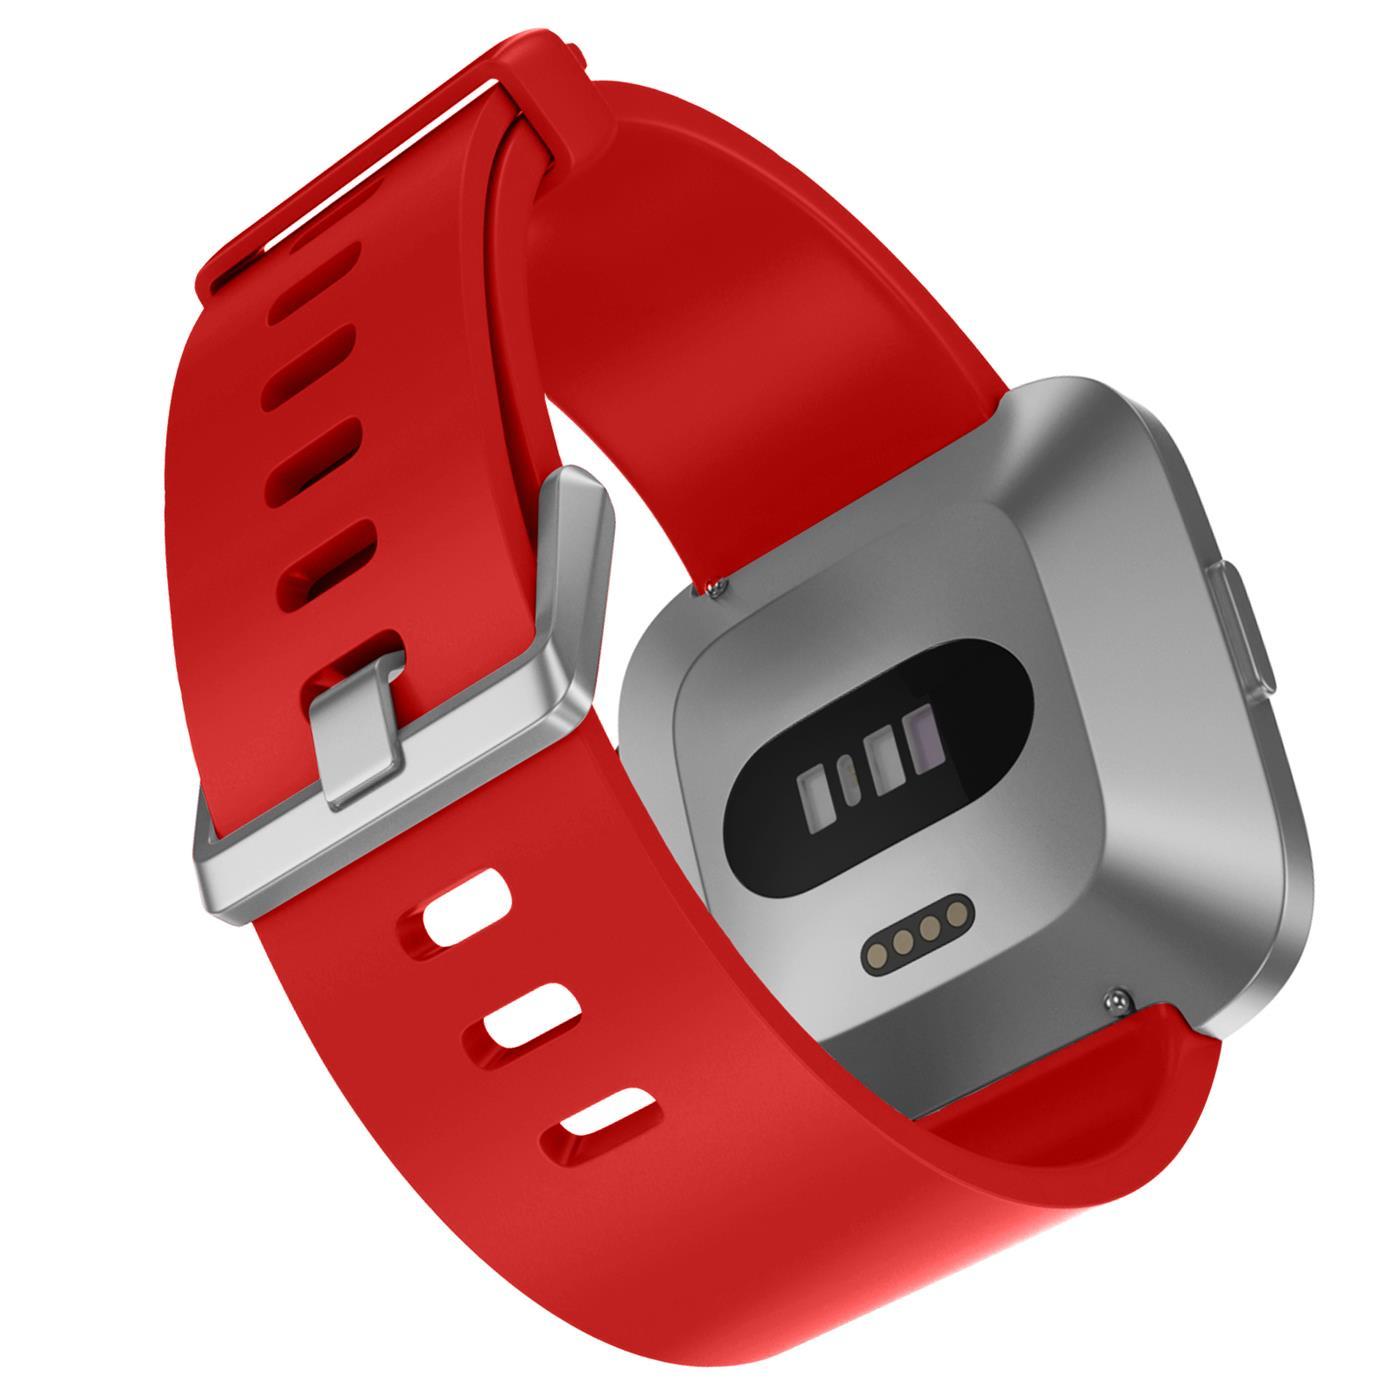 Fitbit-Groesse-S-oder-L-Ersatz-Silikon-Armband-Uhren-Sport-Band-Fitness-Tracker Indexbild 37